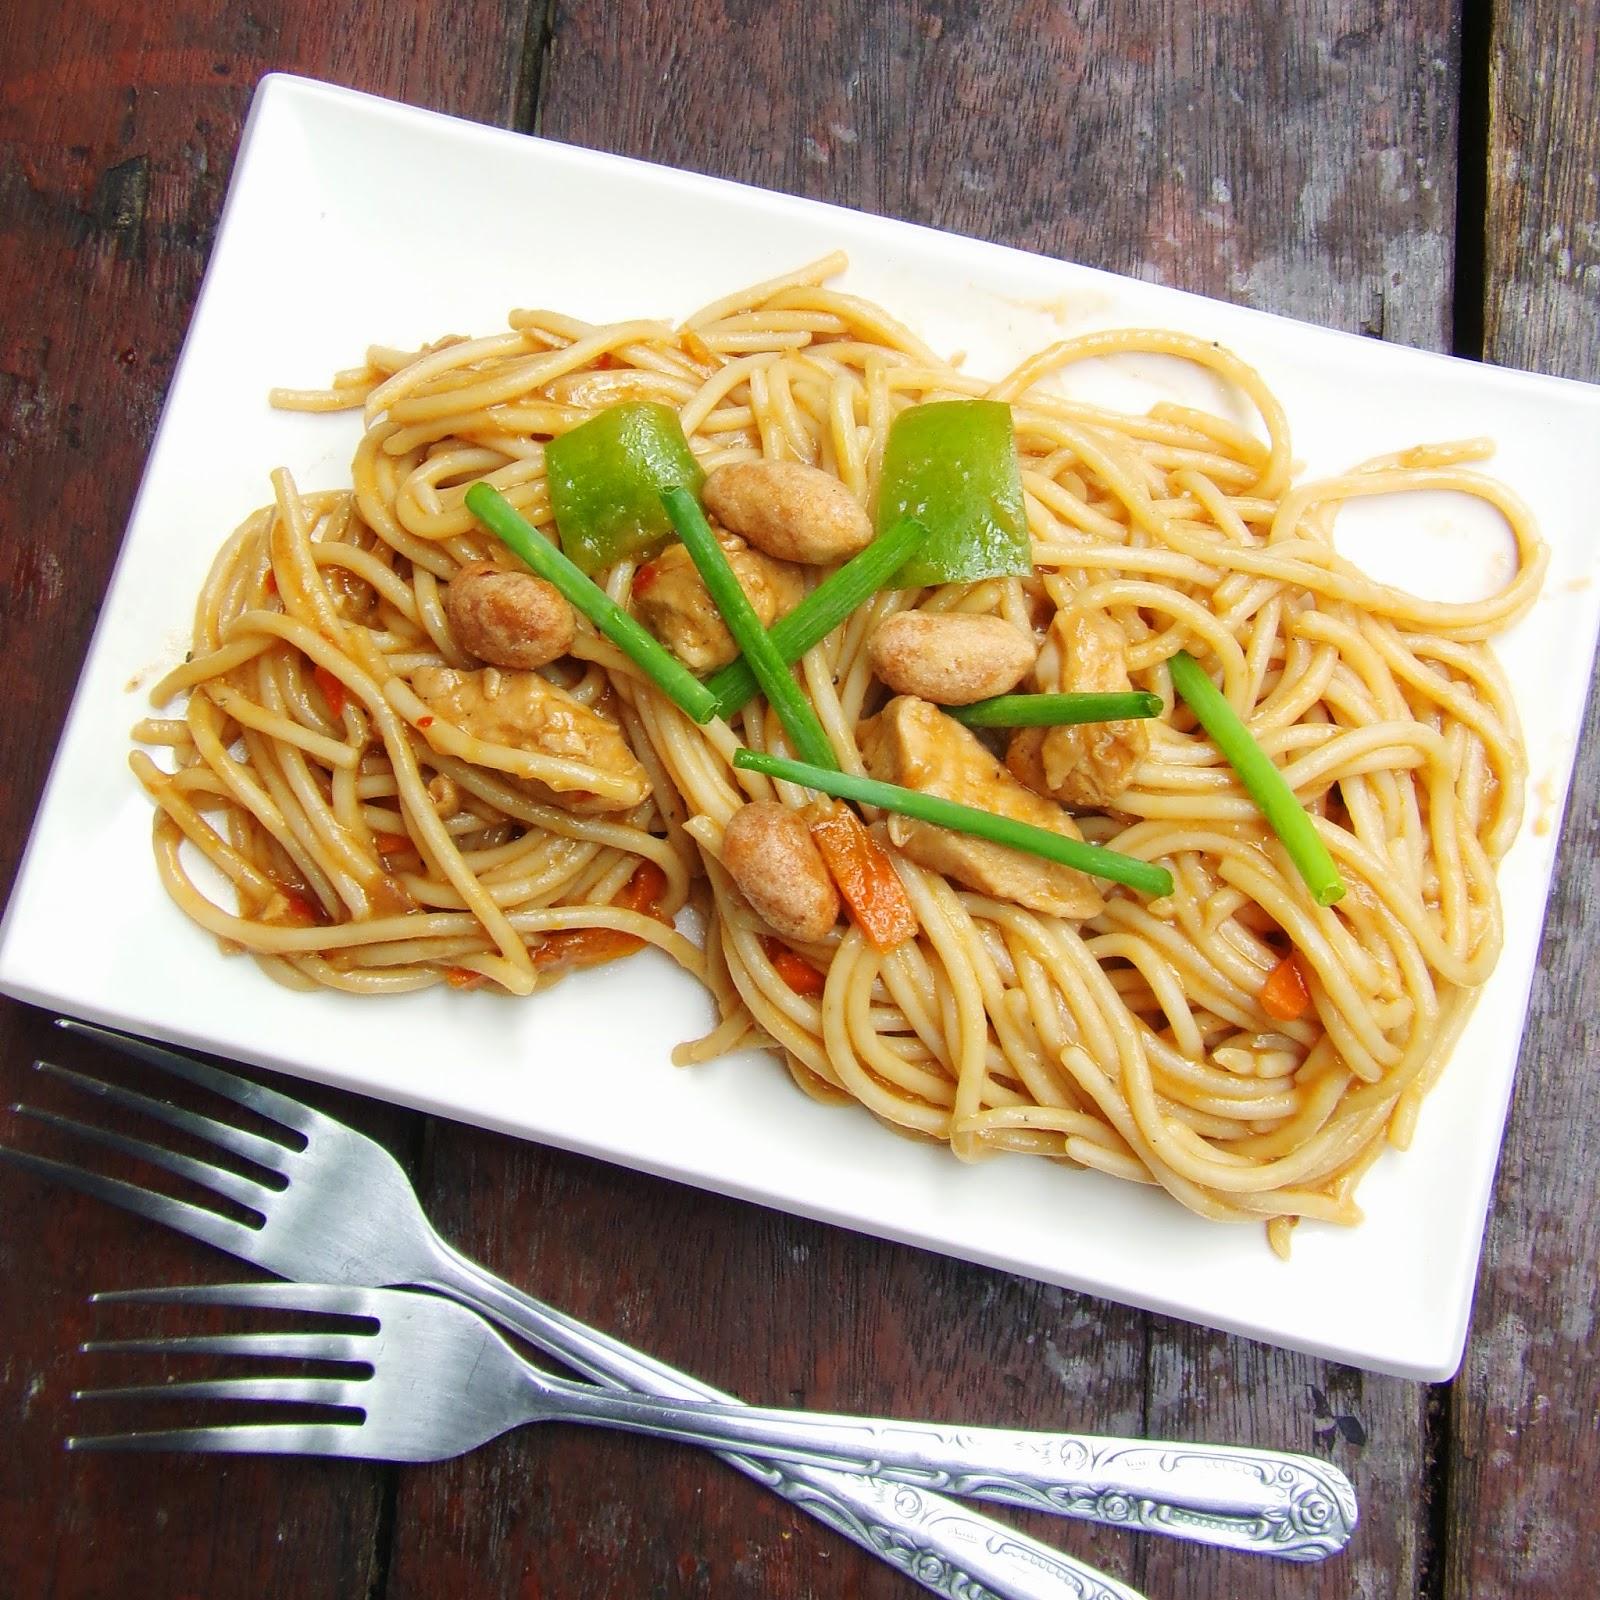 yellow cab pasta, easy pasta recipes, simple chicken recipes, quick and easy pasta recipes, recipes for spaghetti, asian recipe, rcipe chicken